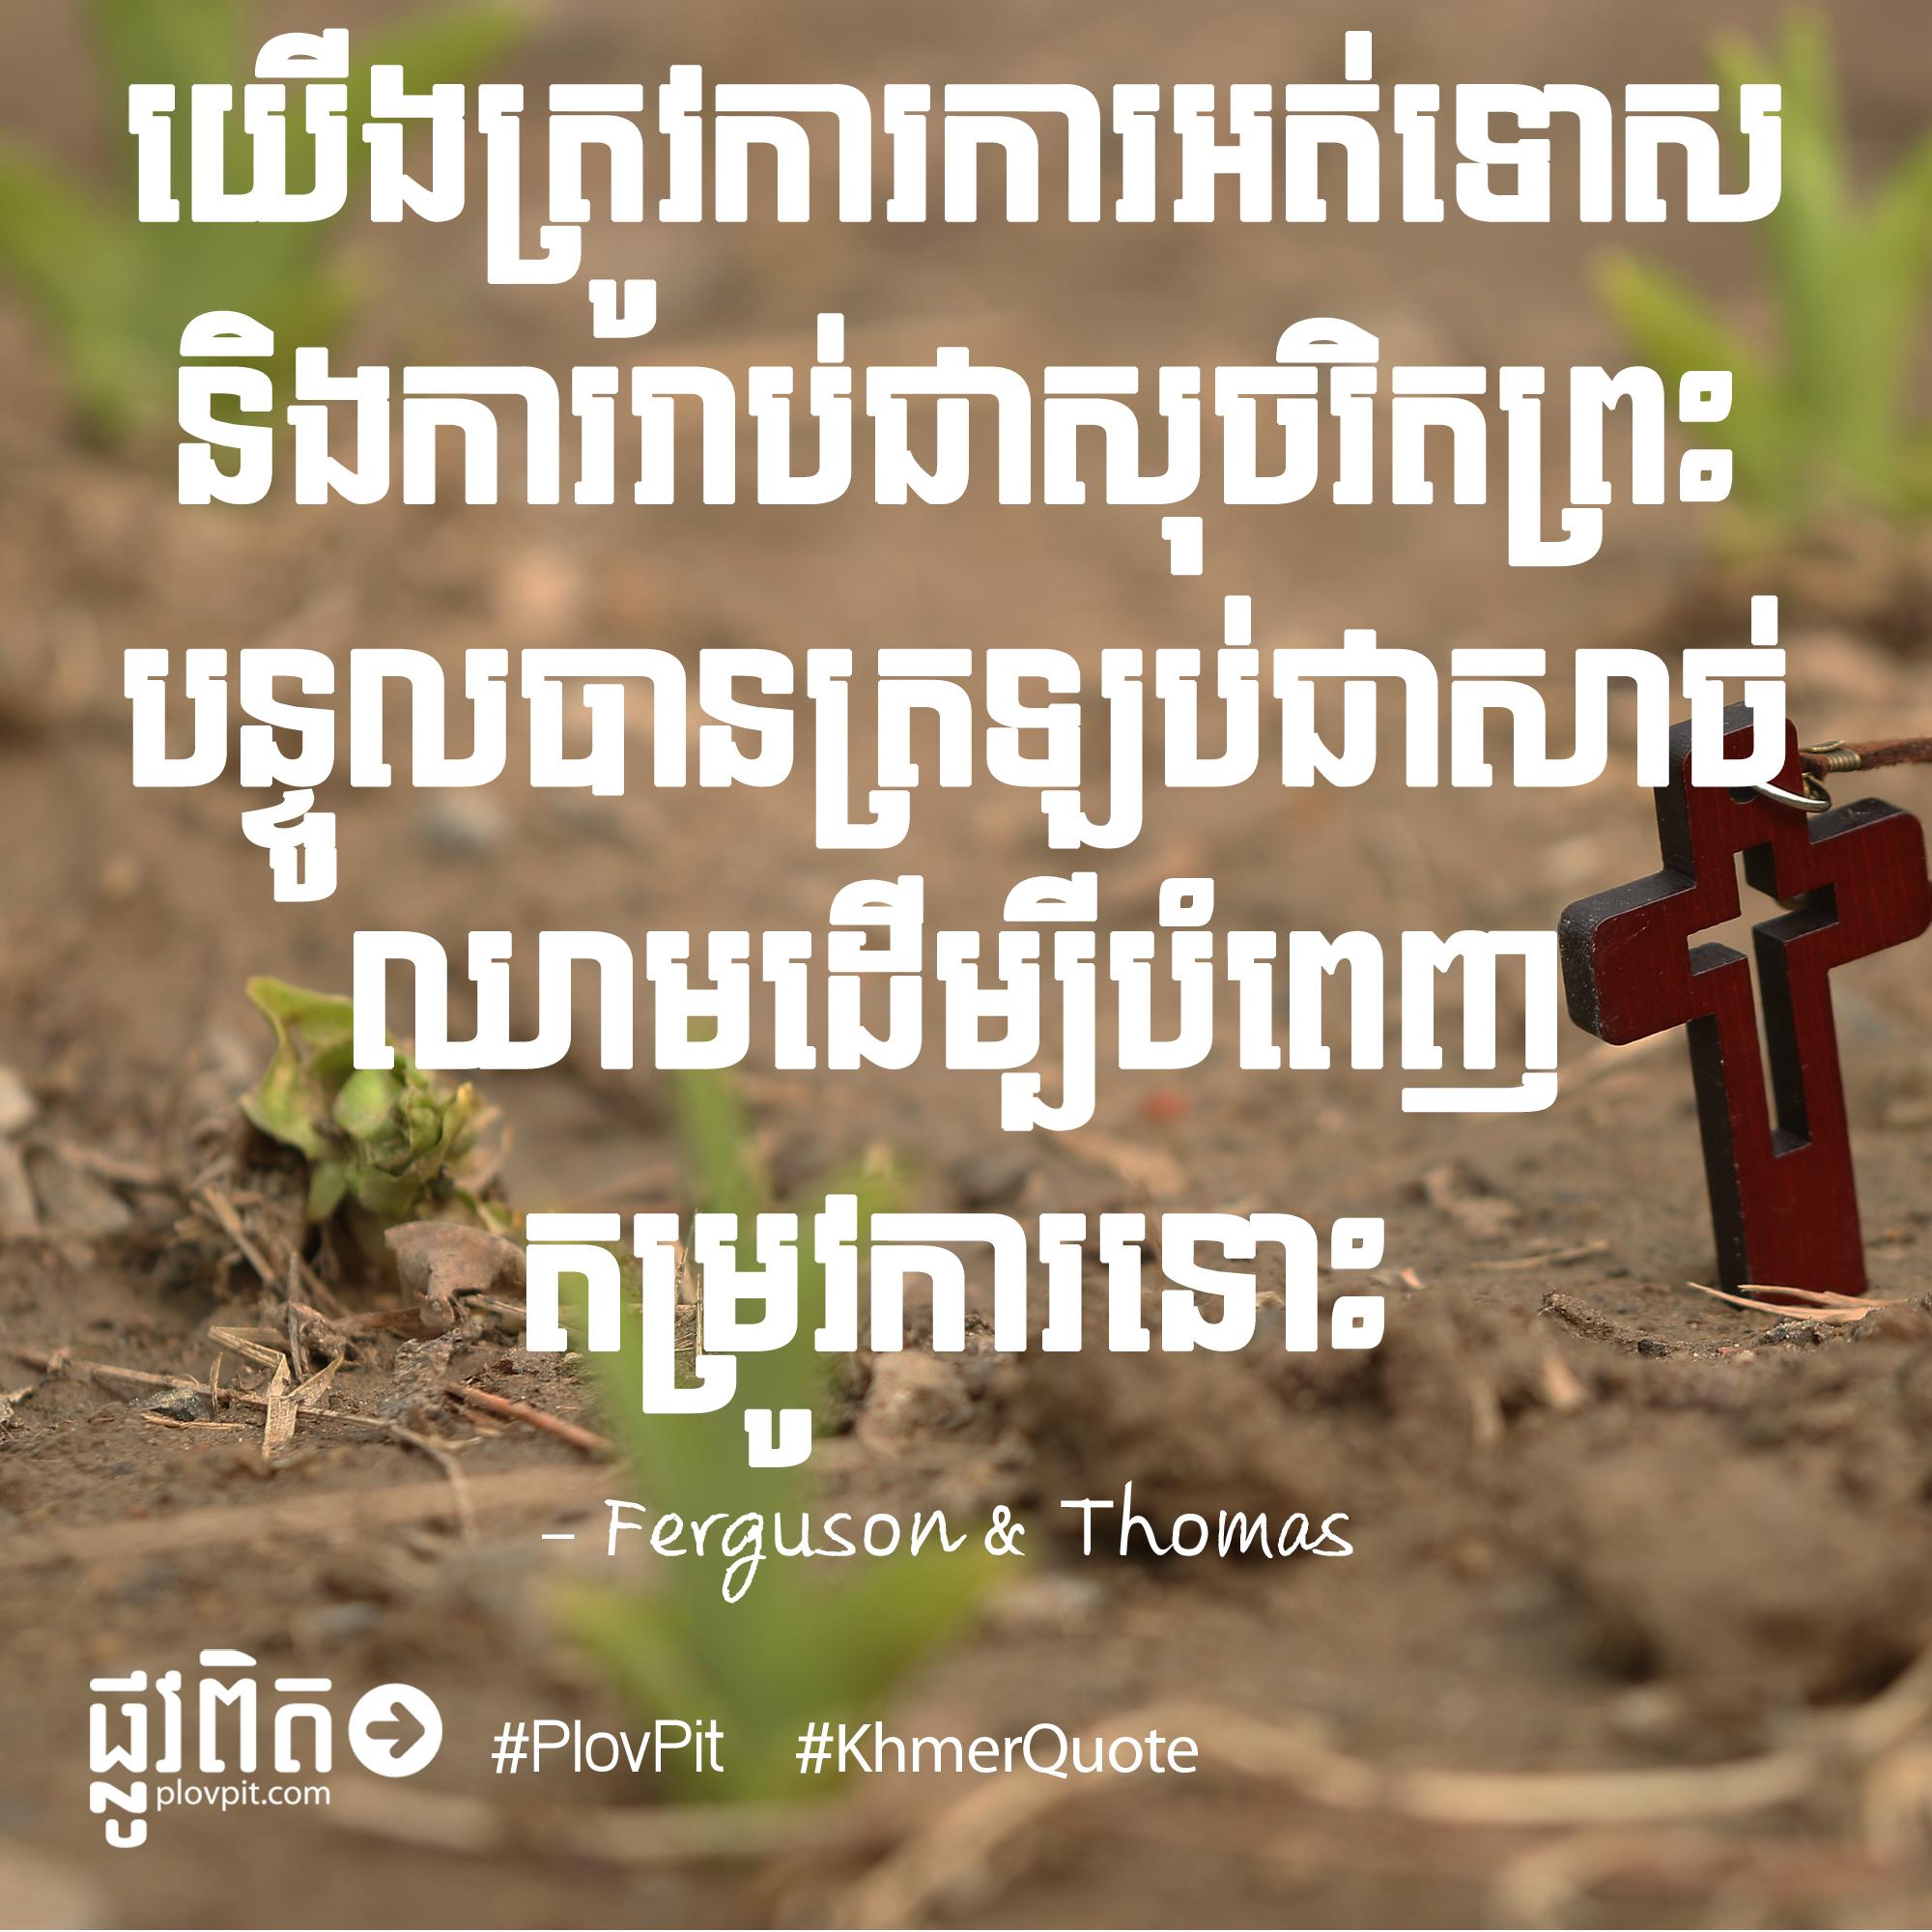 ferguson-thomas-forgiveness-justification